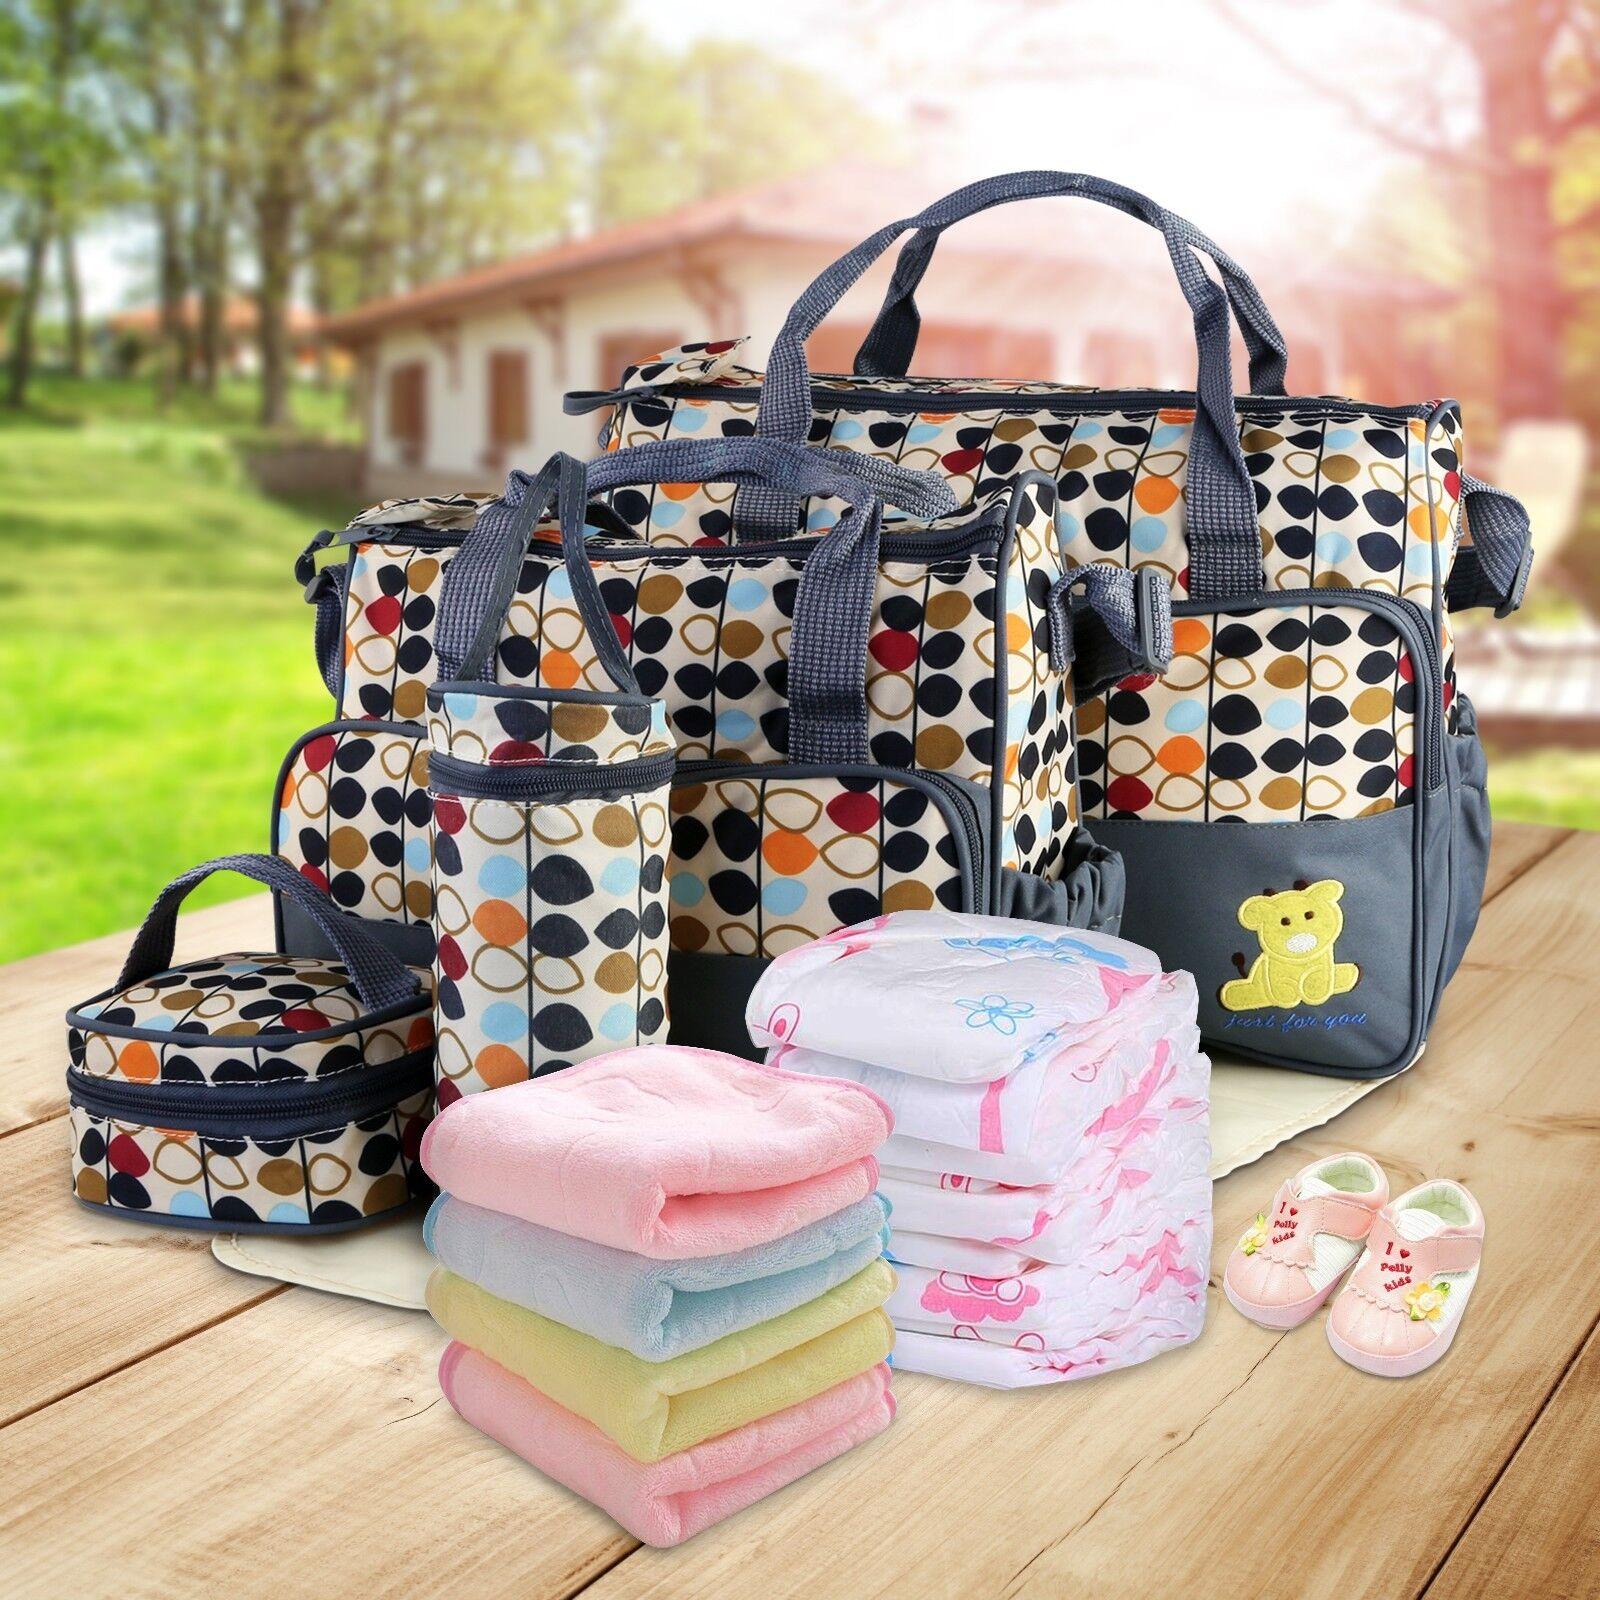 5 Pcs Baby Changing Diaper Nappy Bag Mummy Mother Handbag Multi-functional Set - $20.89